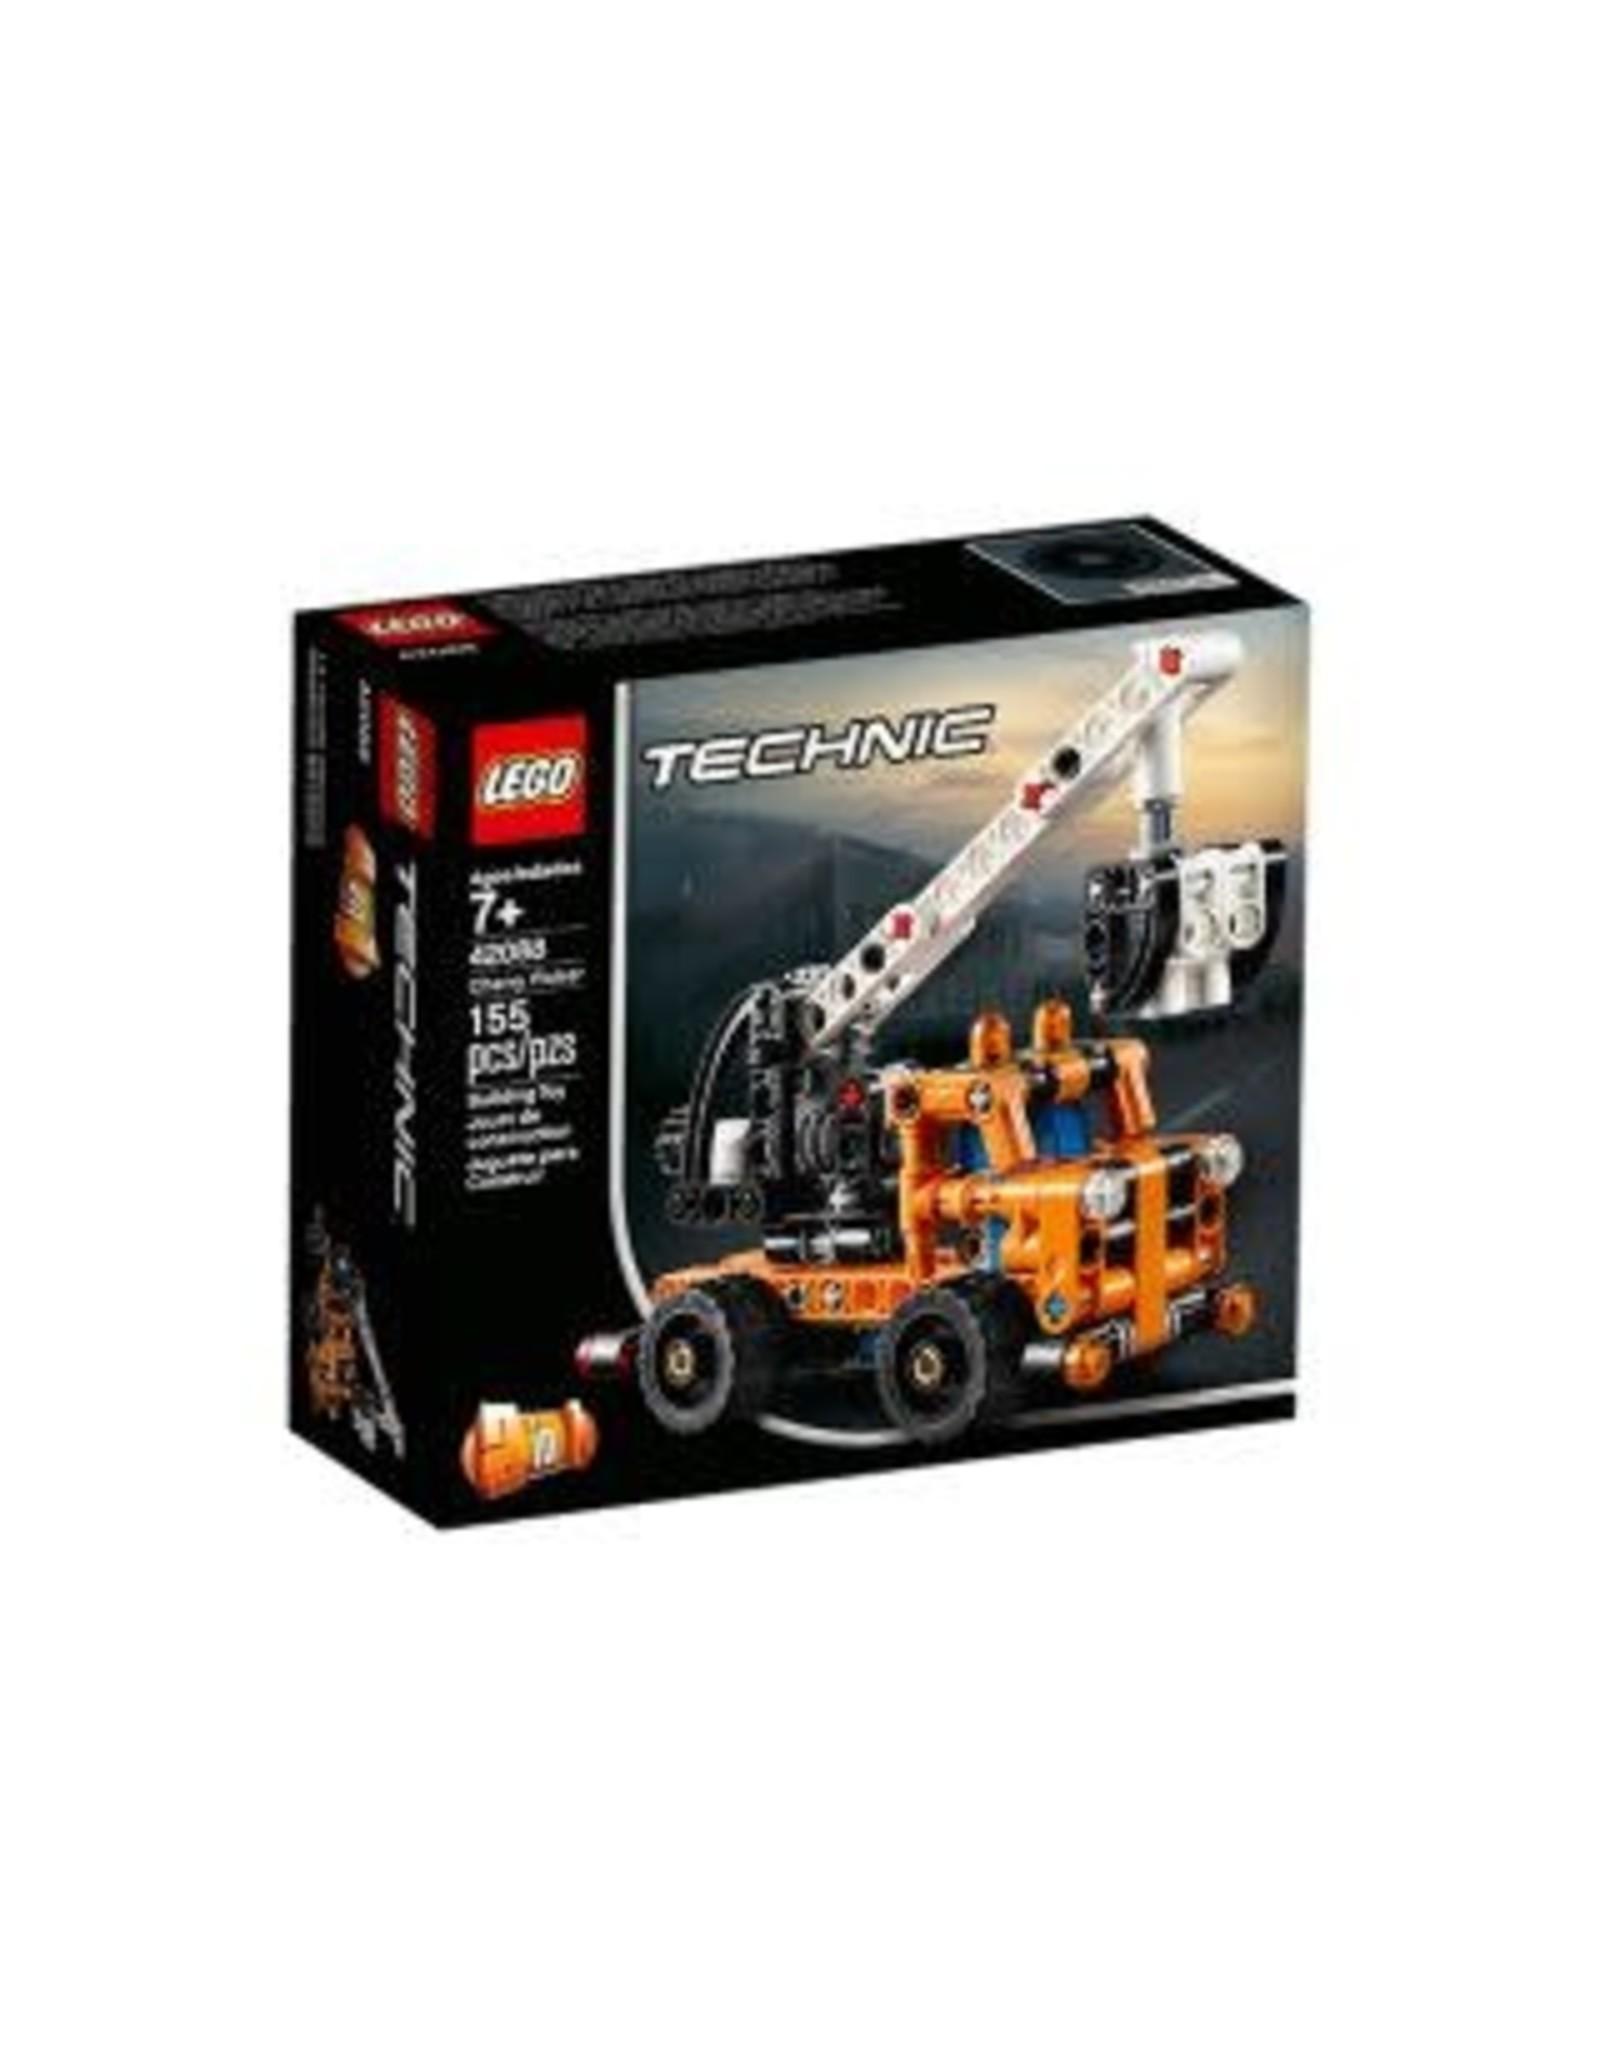 Lego Cherry Picker Technic